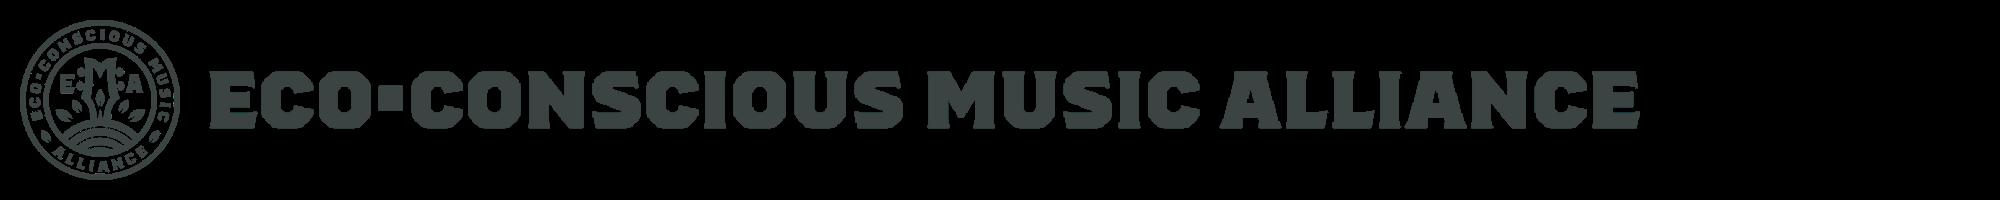 Eco-conscious music alliance